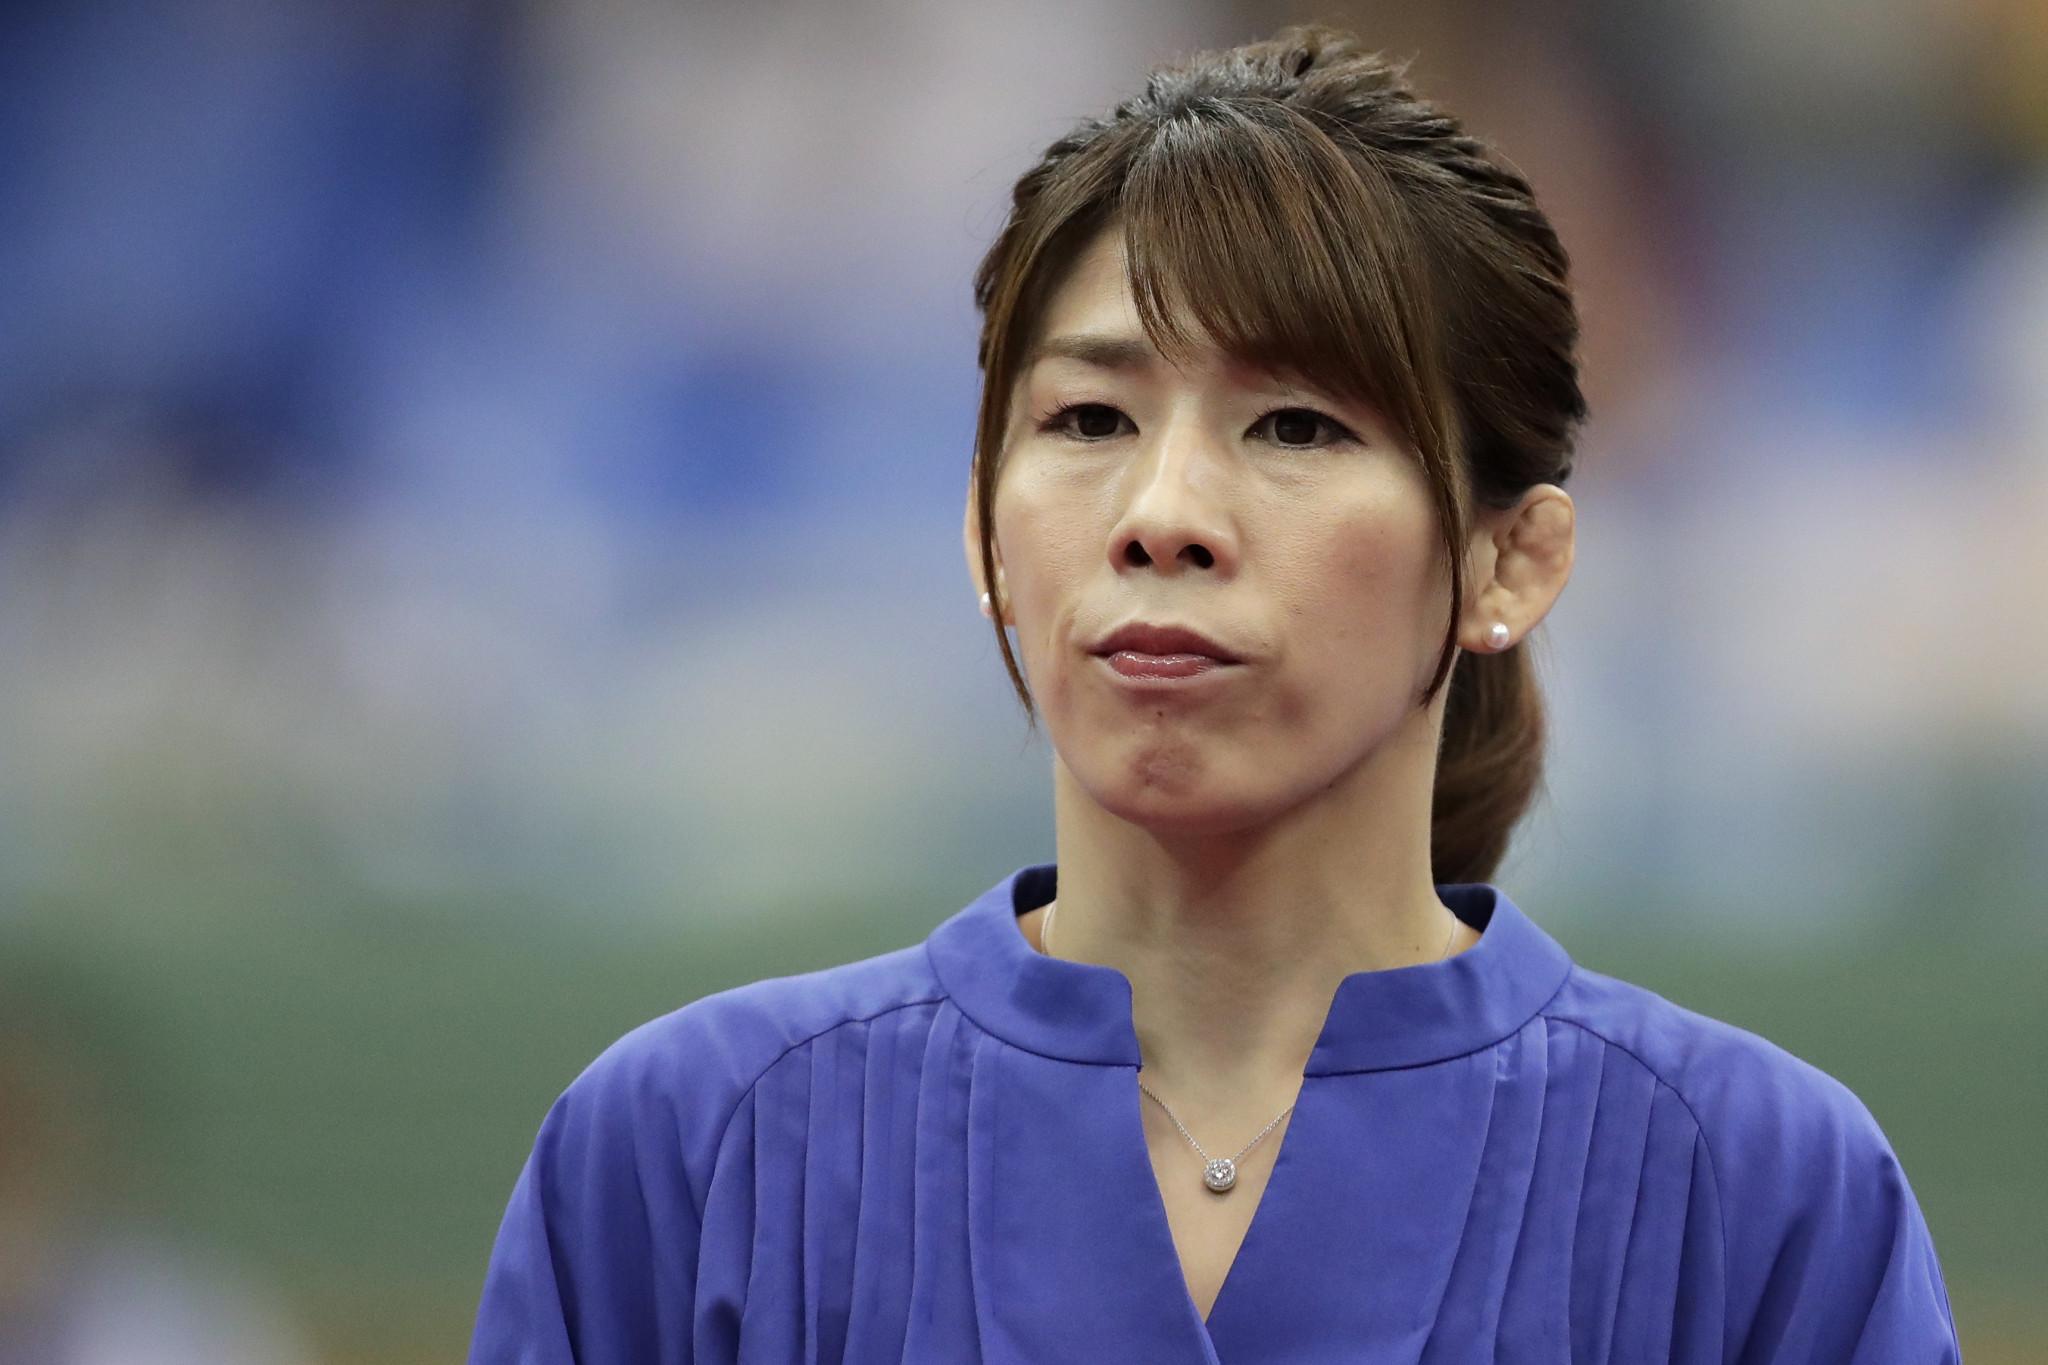 Wrestler Saori Yoshida has been announced as a Torchbearer ©Getty Images